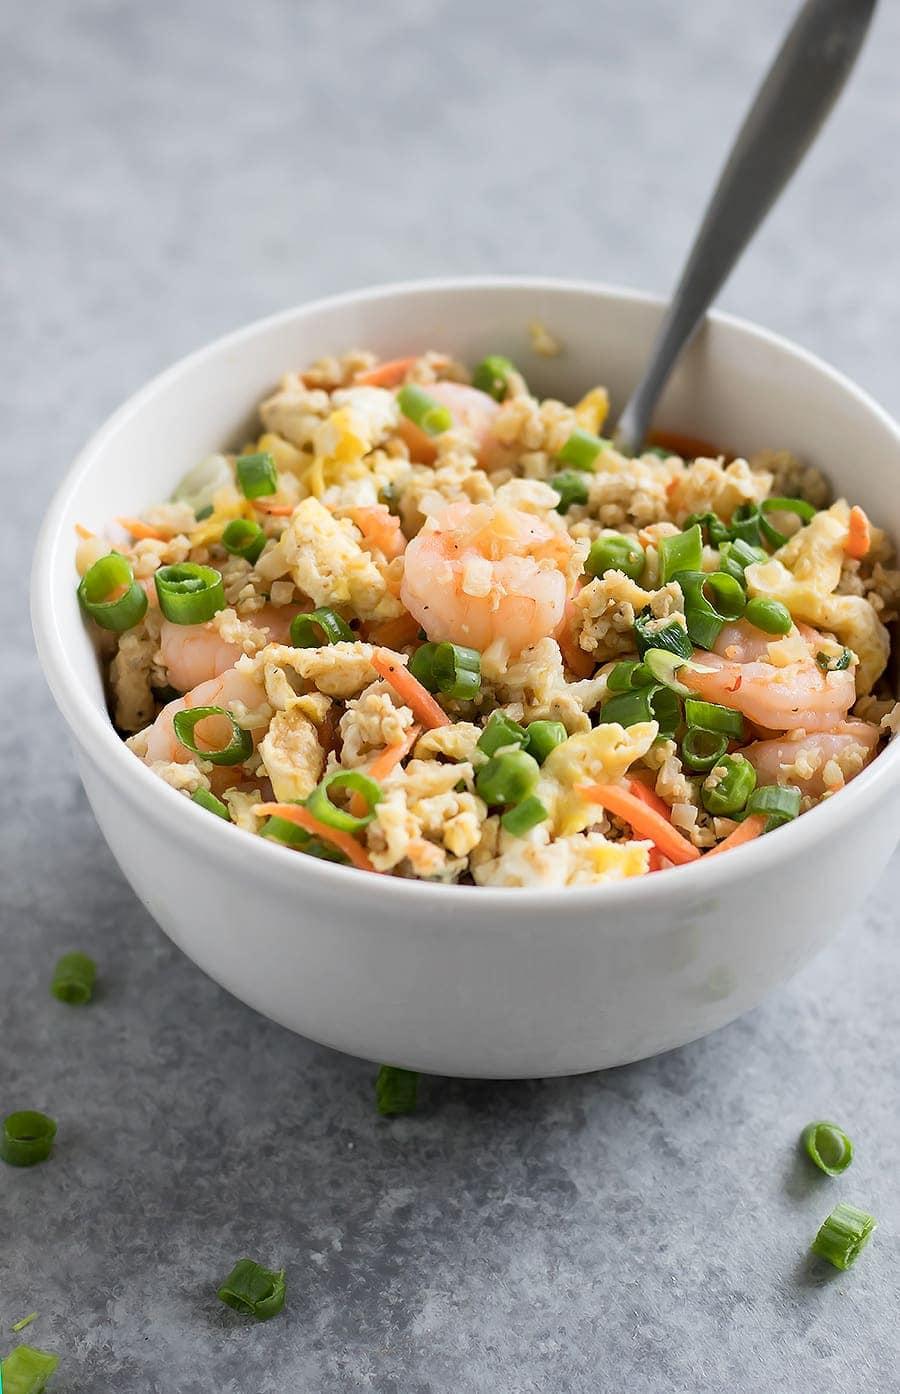 15 minute cauliflower shrimp fried rice a sassy spoon make cauliflower shrimp fried rice at home using riced cauliflower carrots ccuart Choice Image